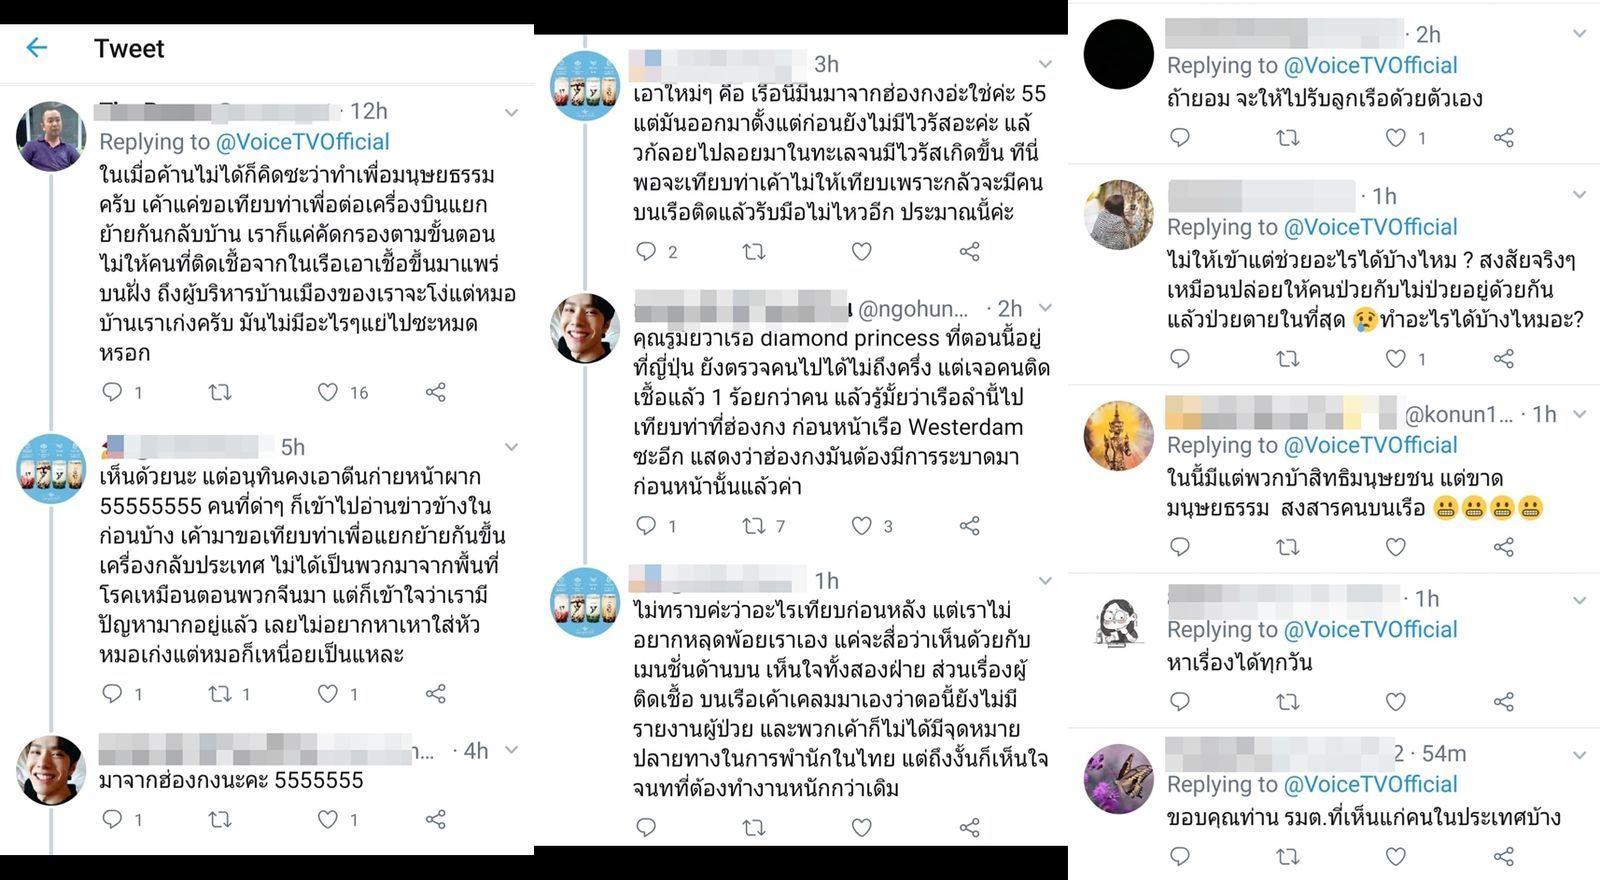 TwitterComments-เรือสำราญไวรัสโคโรนา-1.jpg